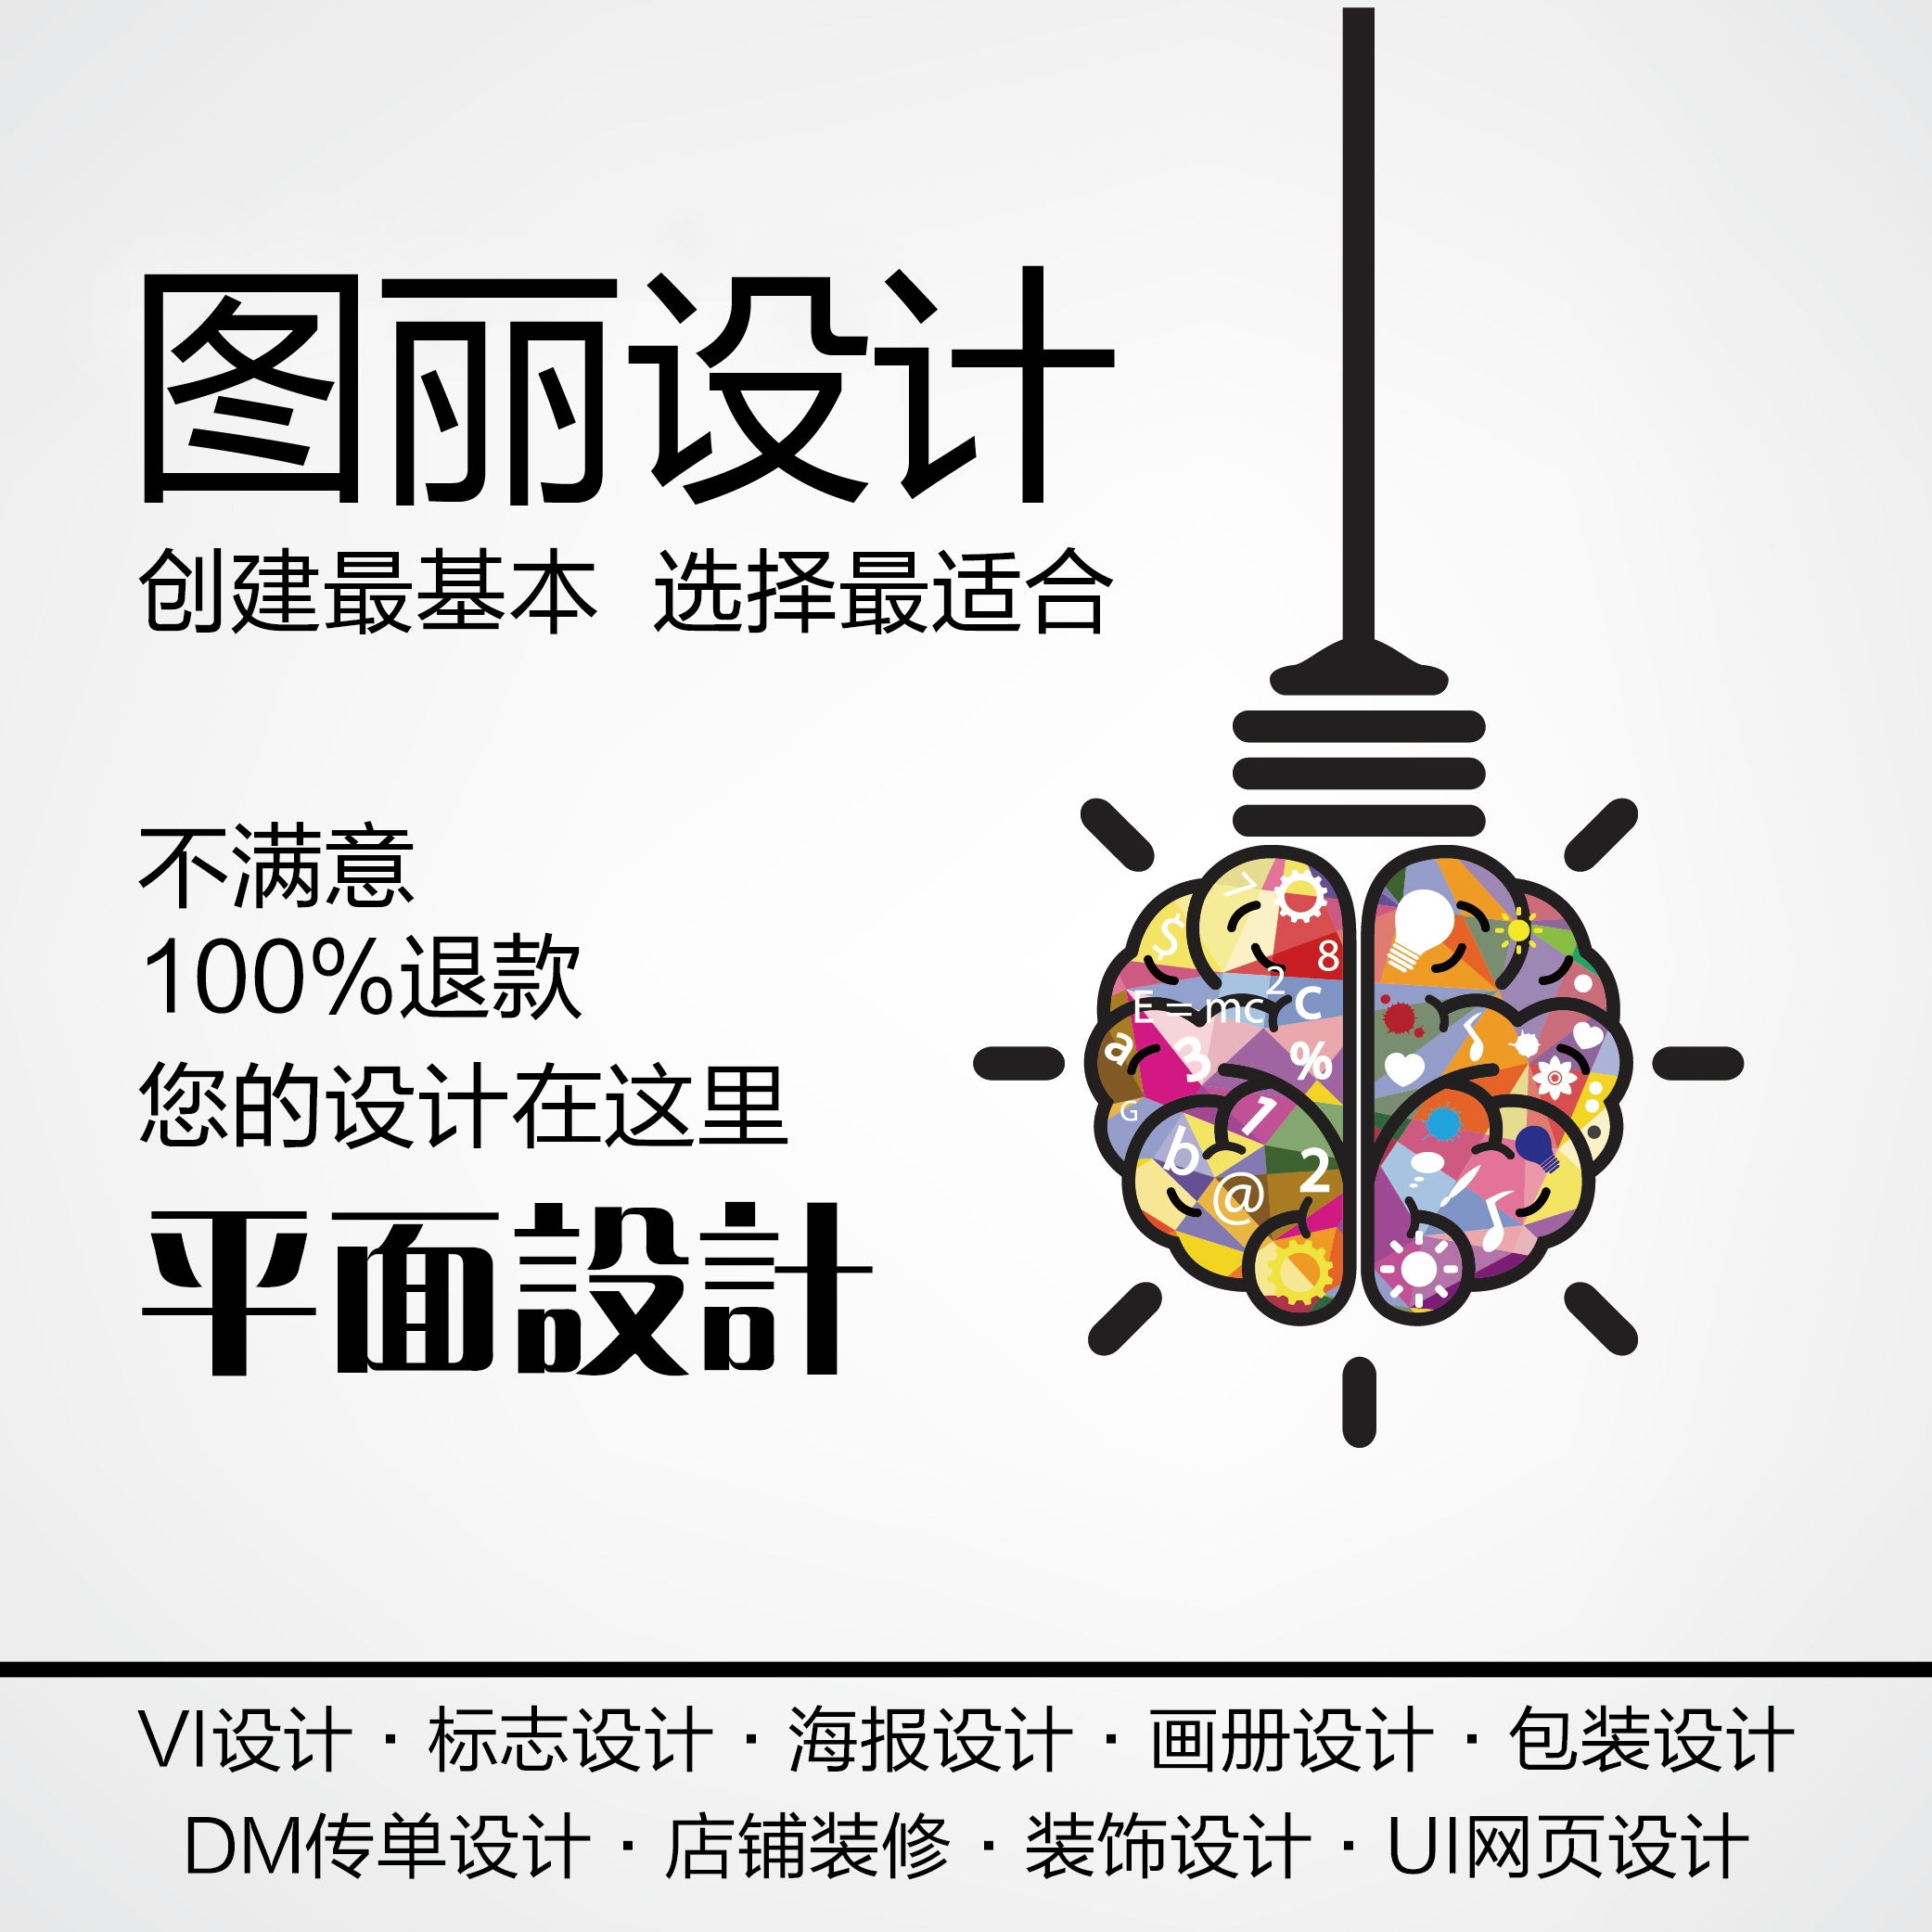 http://www.micehome.com.cn/uploadfile/product/11/2016/05/30/1464590287.jpg